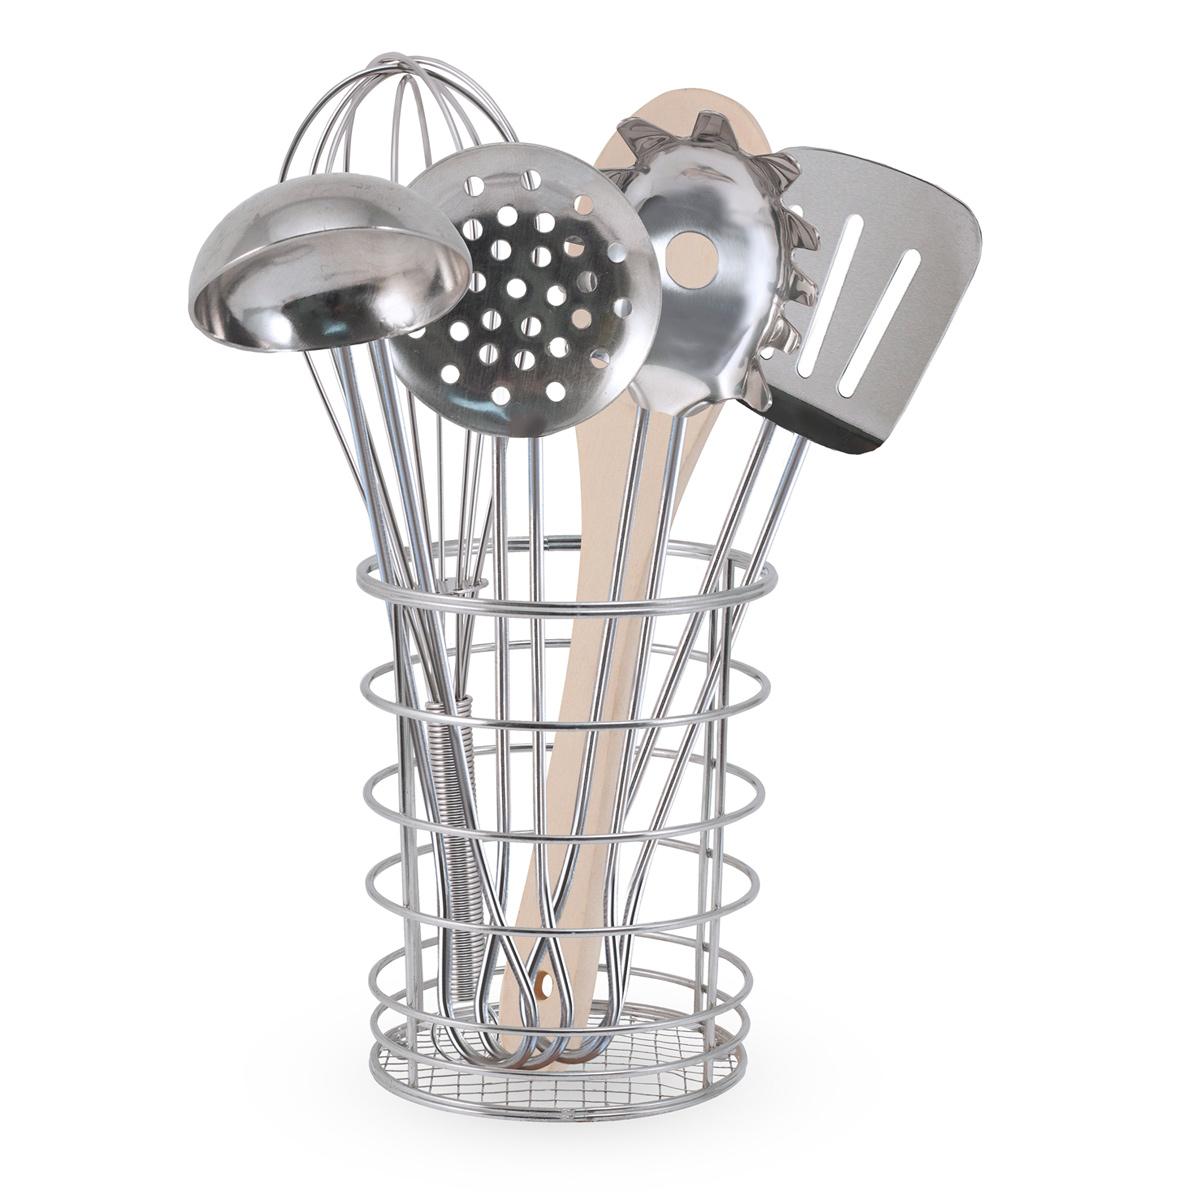 Melissa doug set di utensili per la cucina 19351 pirum for Utensili per la cucina